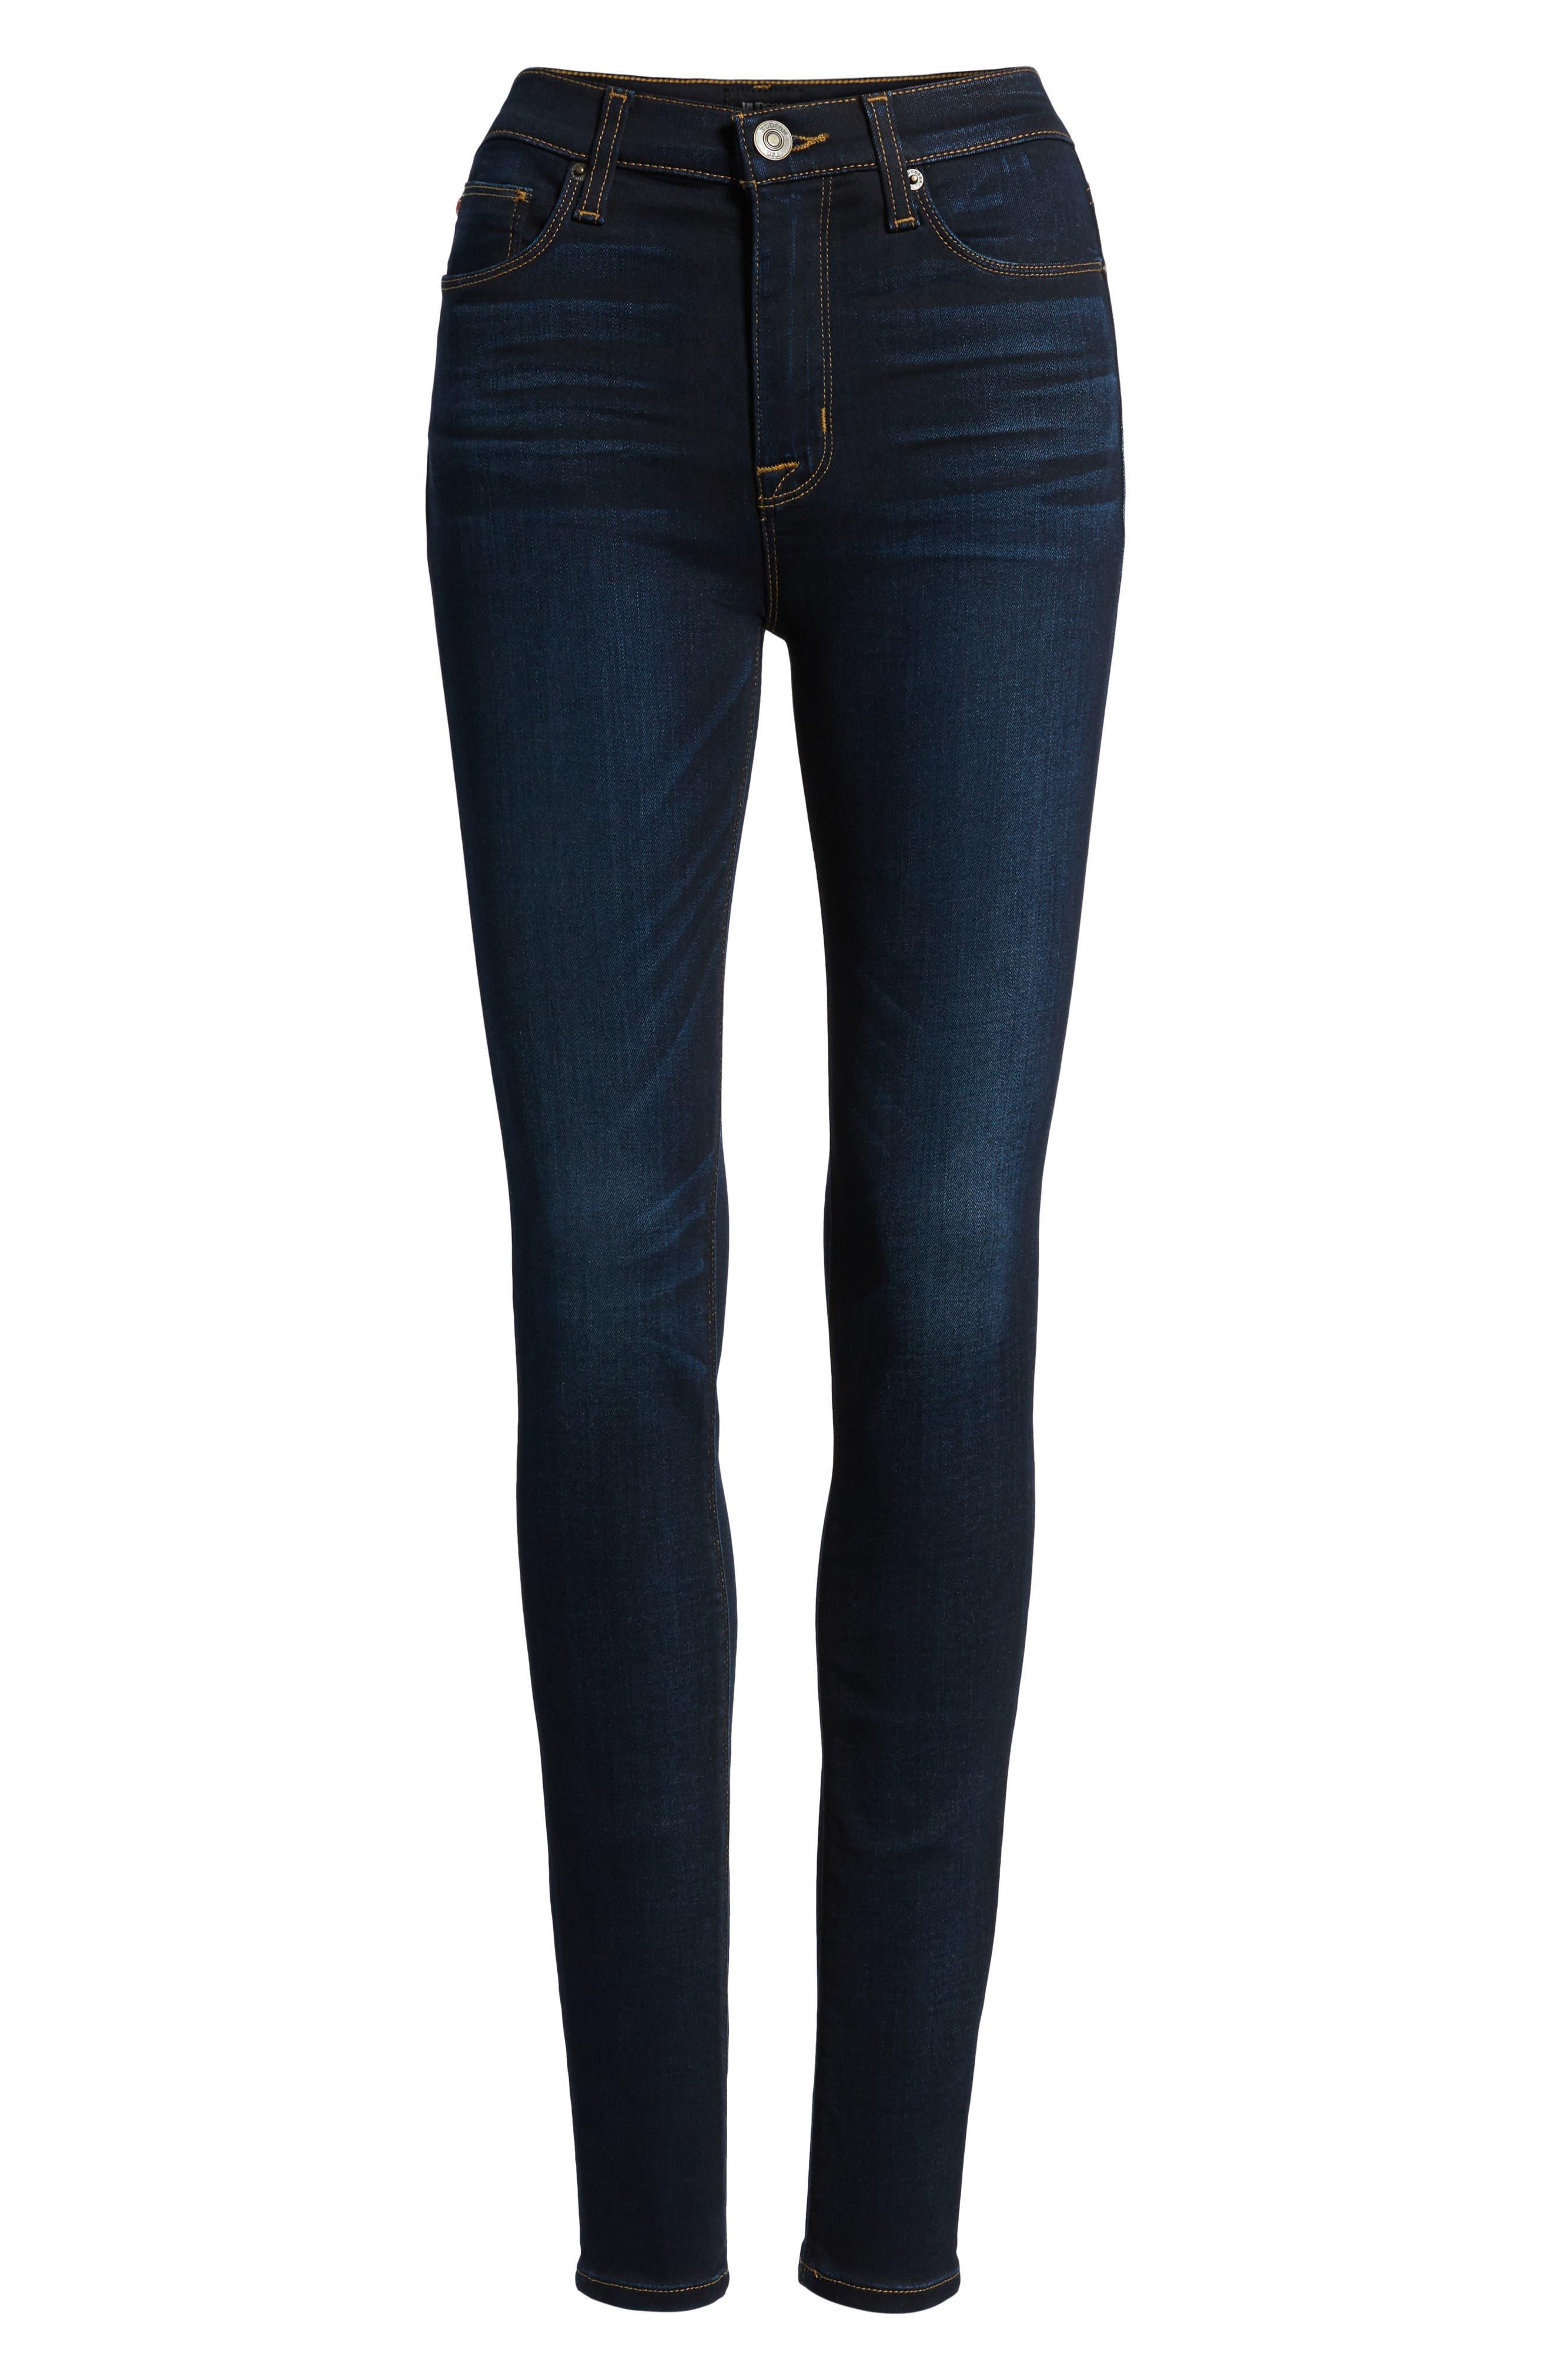 Barbara High Waist Ankle Supermodel Skinny Jeans,                             Alternate thumbnail 7, color,                             402